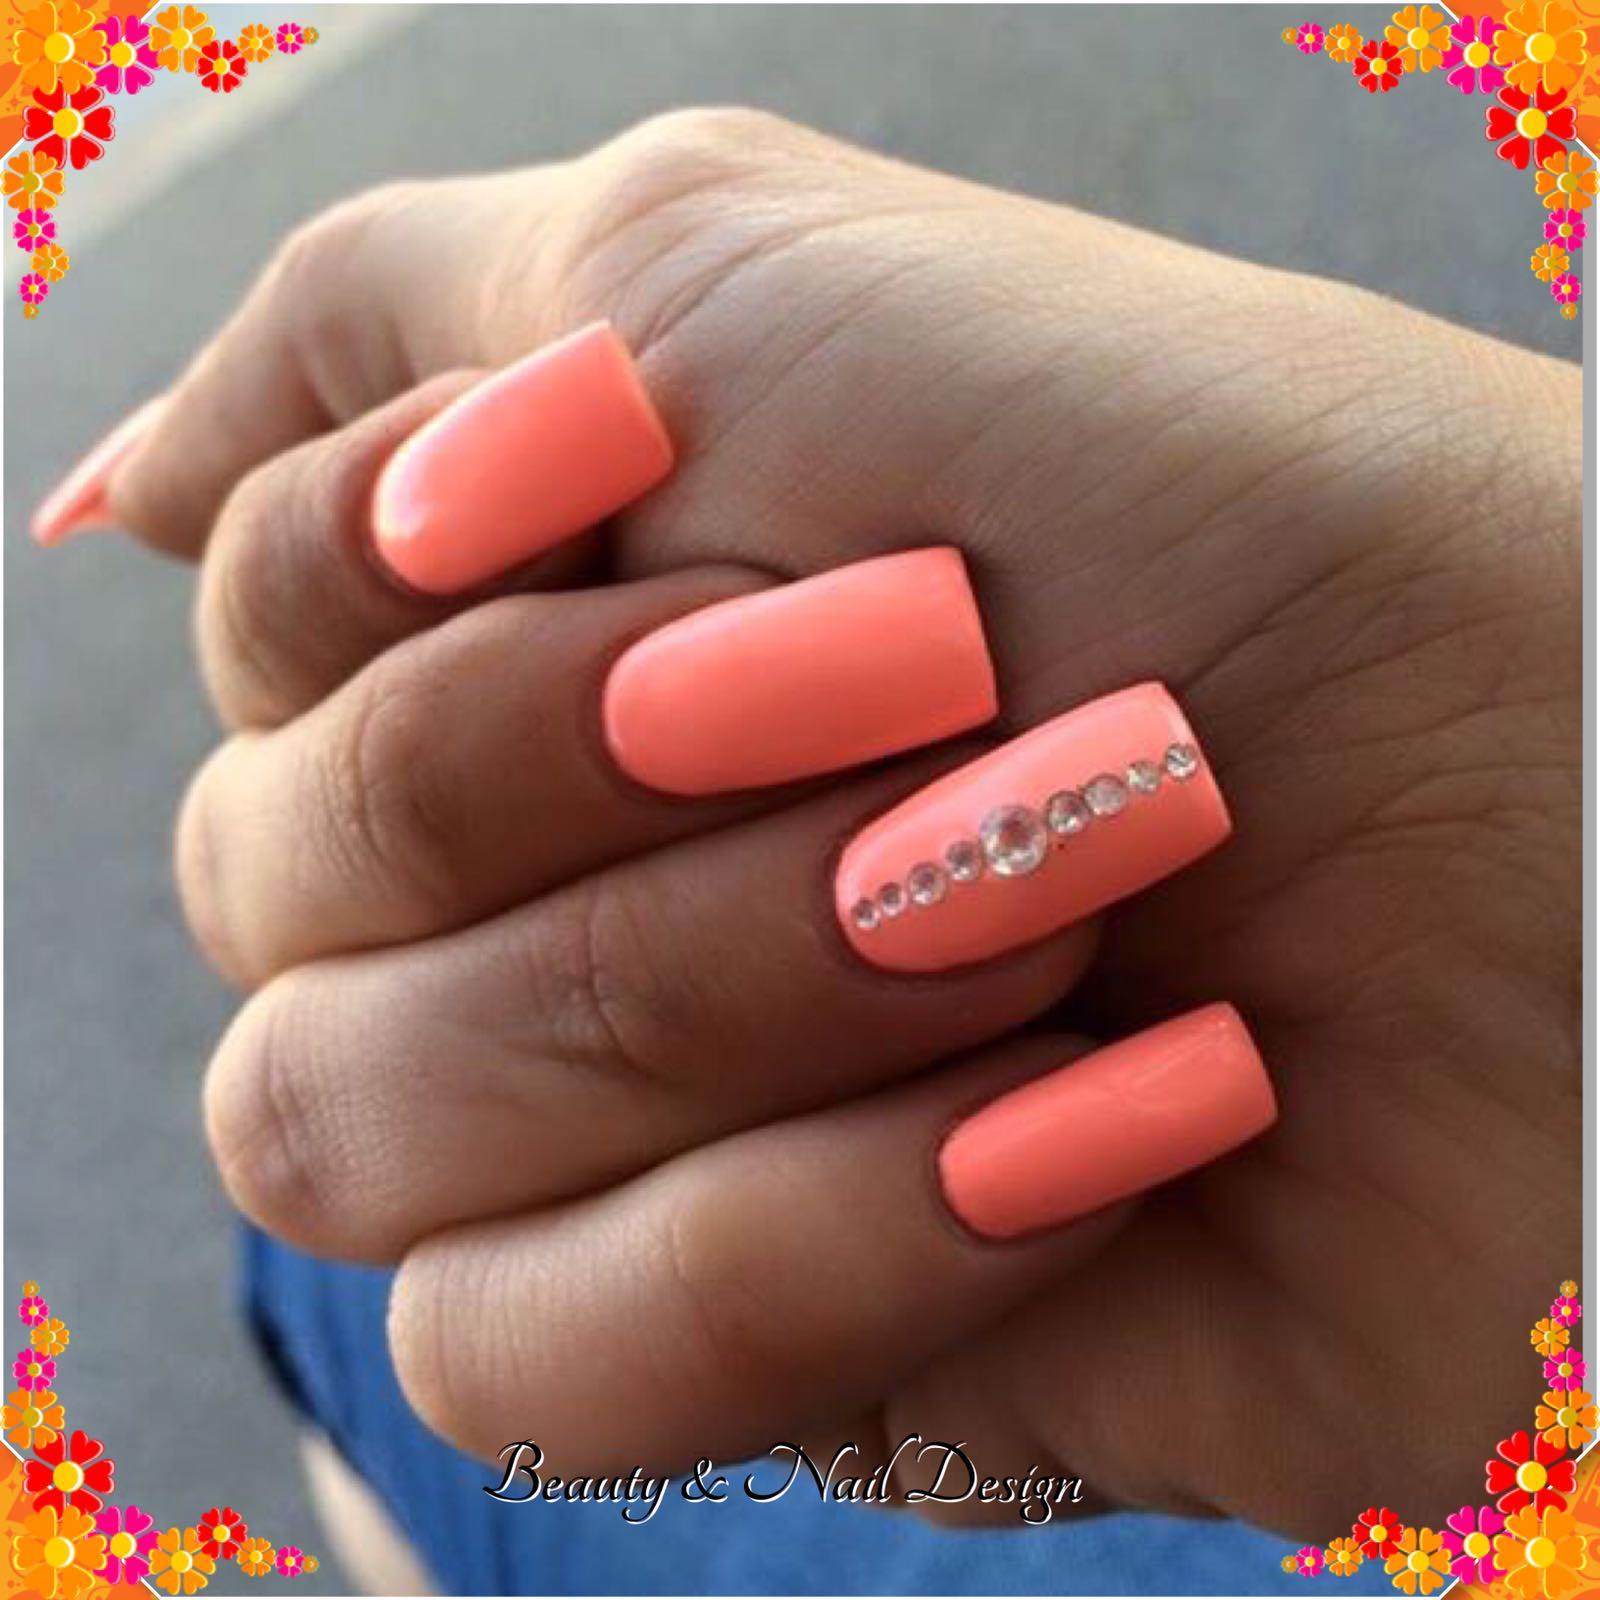 Beauty Nail Design